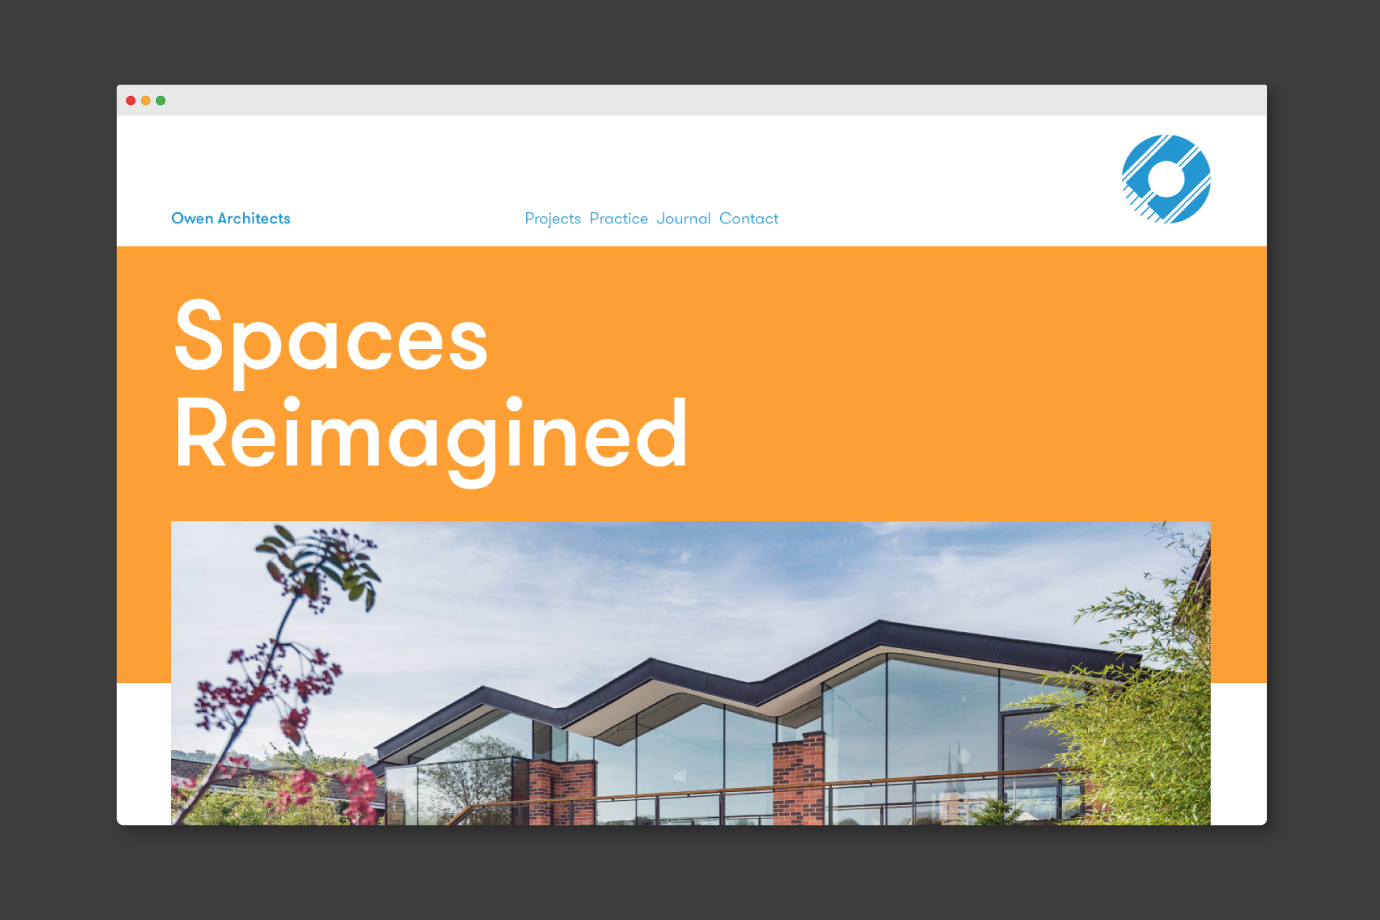 http://spystudio.co.uk/wp-content/uploads/2017/03/Owen_Architects_web-1.jpg